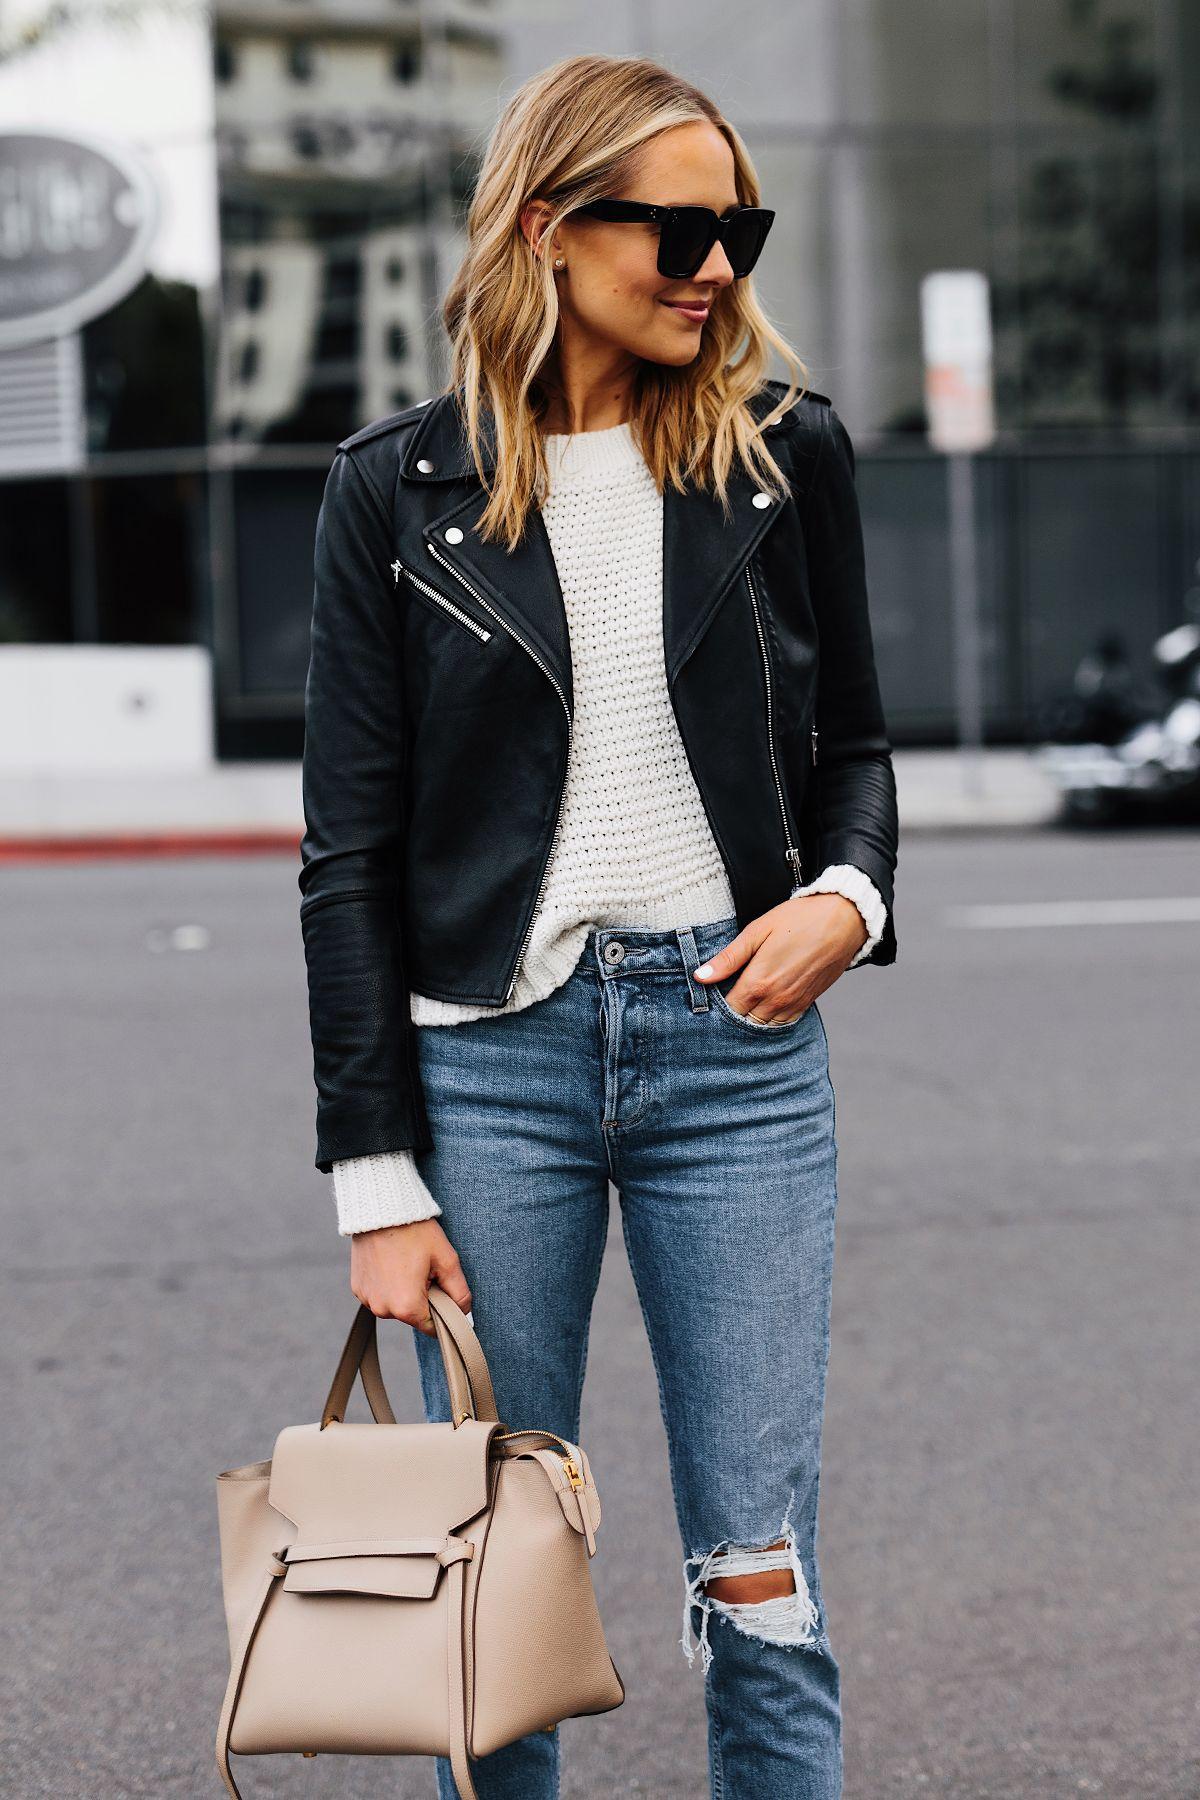 deedd5c7c8b Blonde Woman Wearing Club Monaco Black Leather Jacket Ivory Chunky Sweater  Paige Ripped Jeans Celine Mini Belt Bag Fashion Jackson San Diego Fashion  Blogger ...